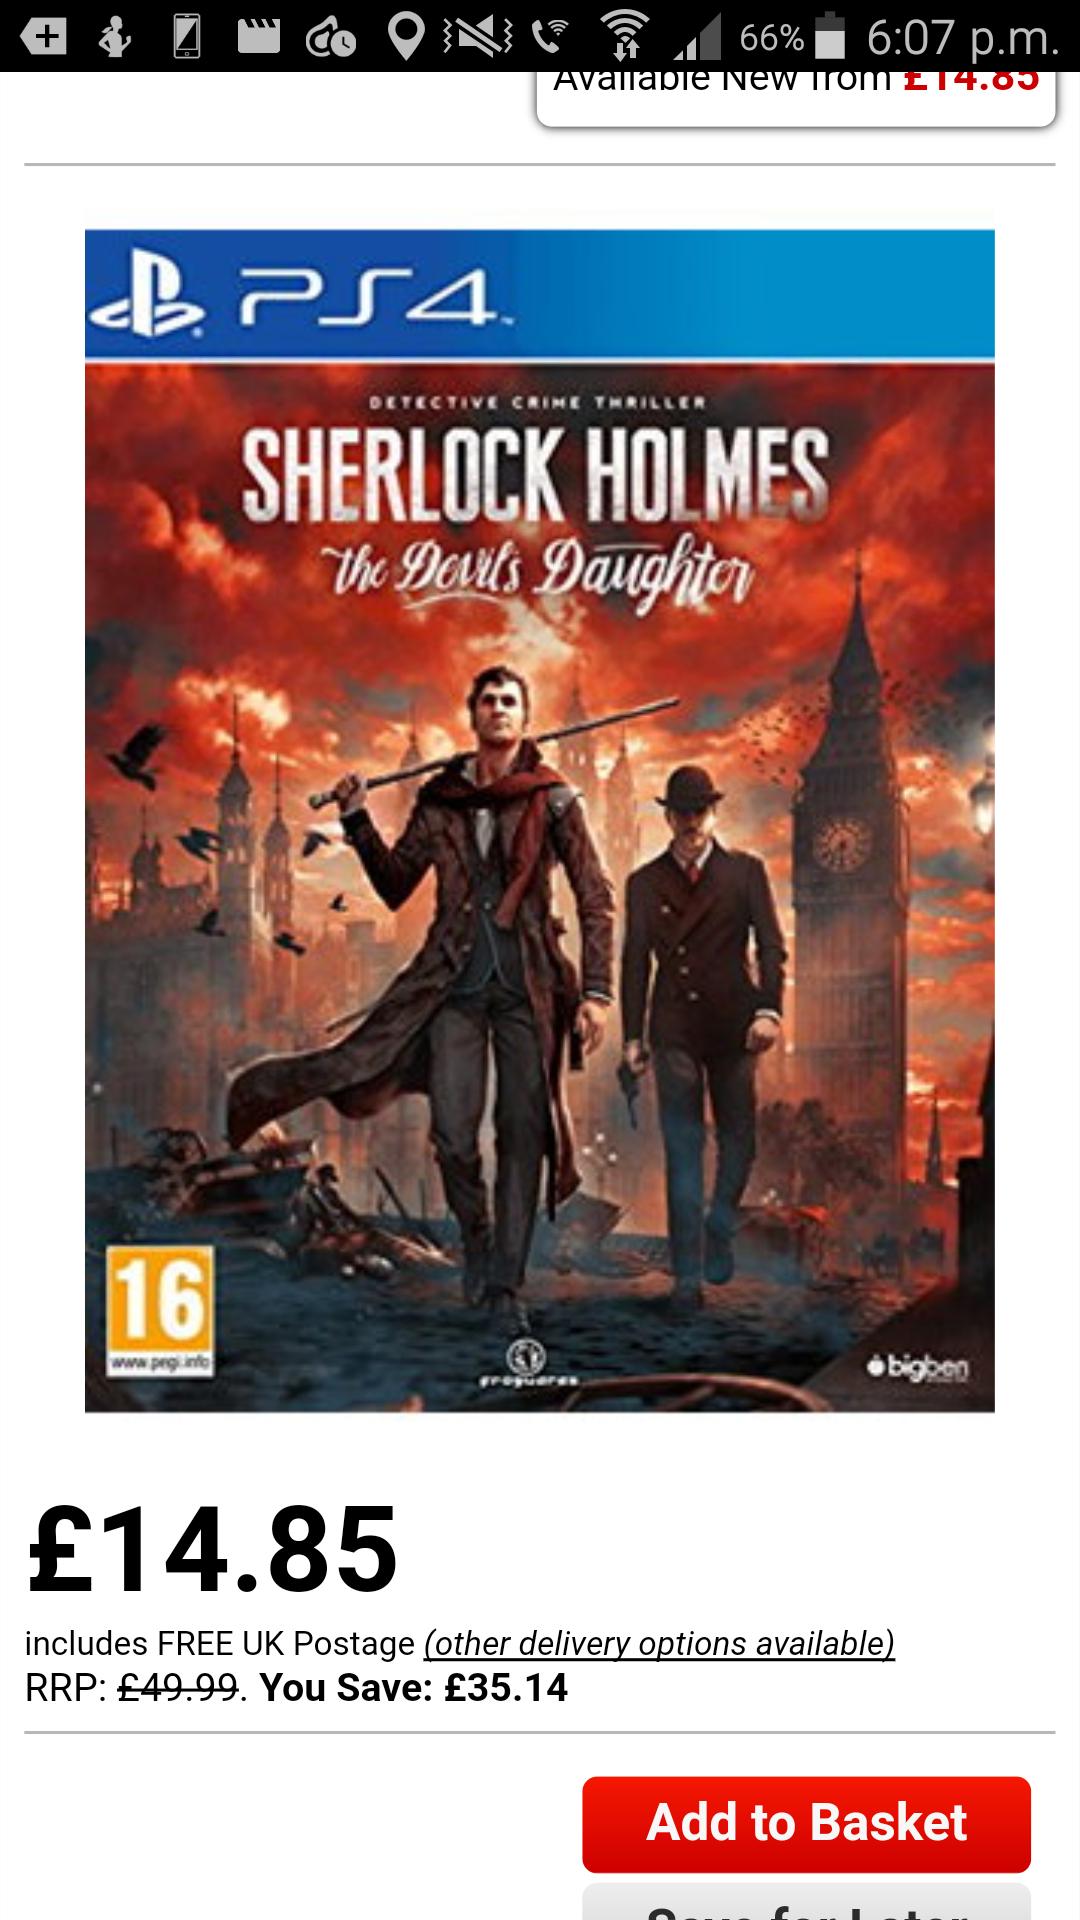 Sherlock holmes ps4 £14.85 @ Base